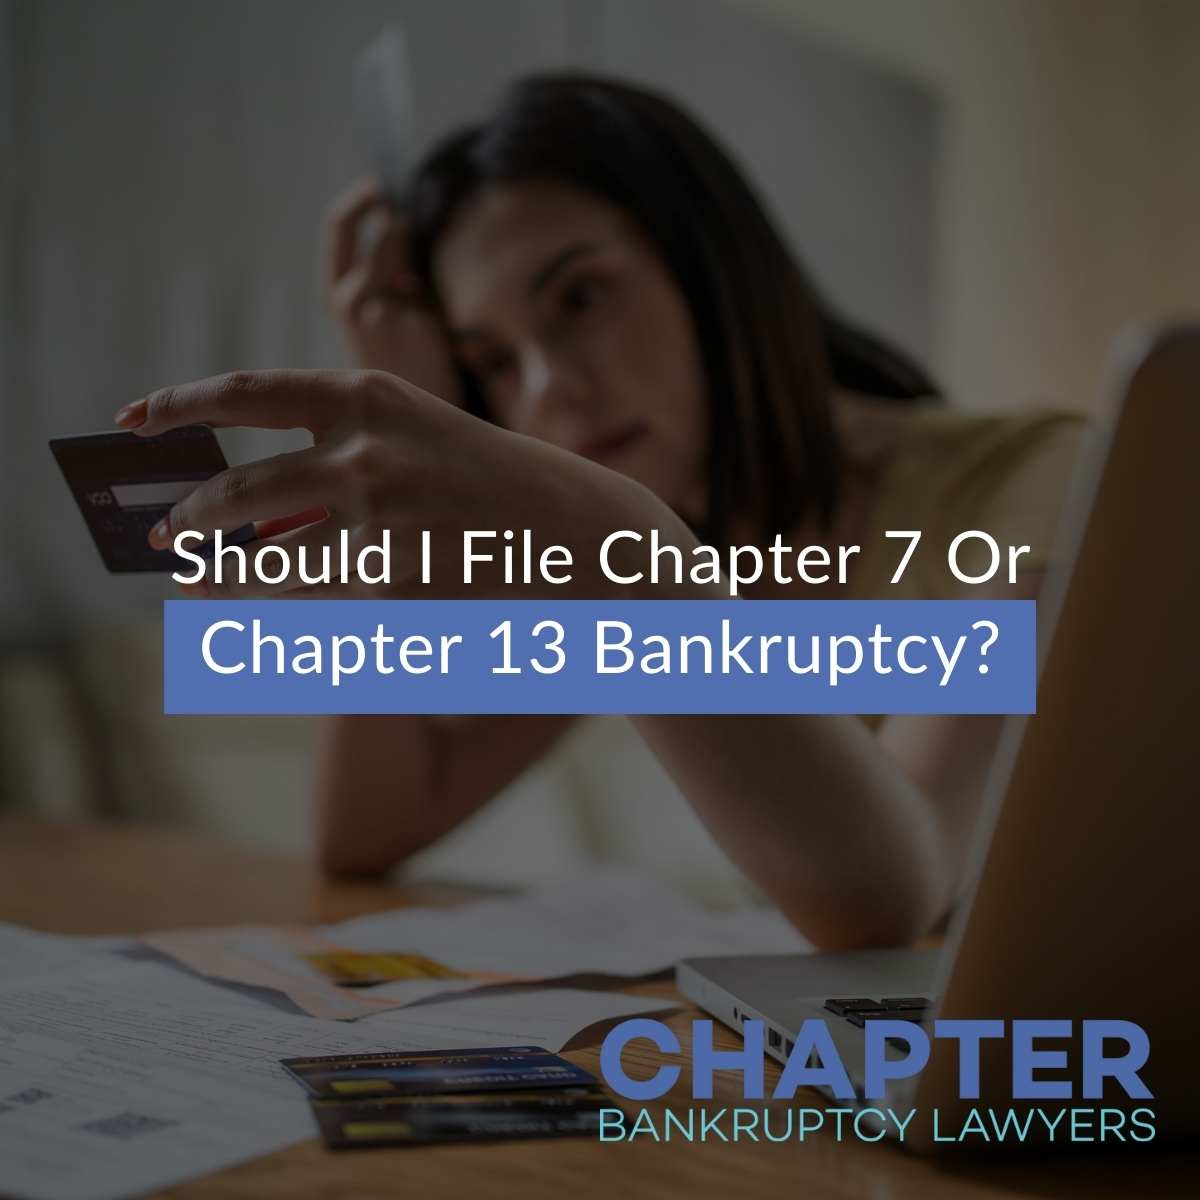 Should I File Chapter 7 Or Chapter 13 Bankruptcy?